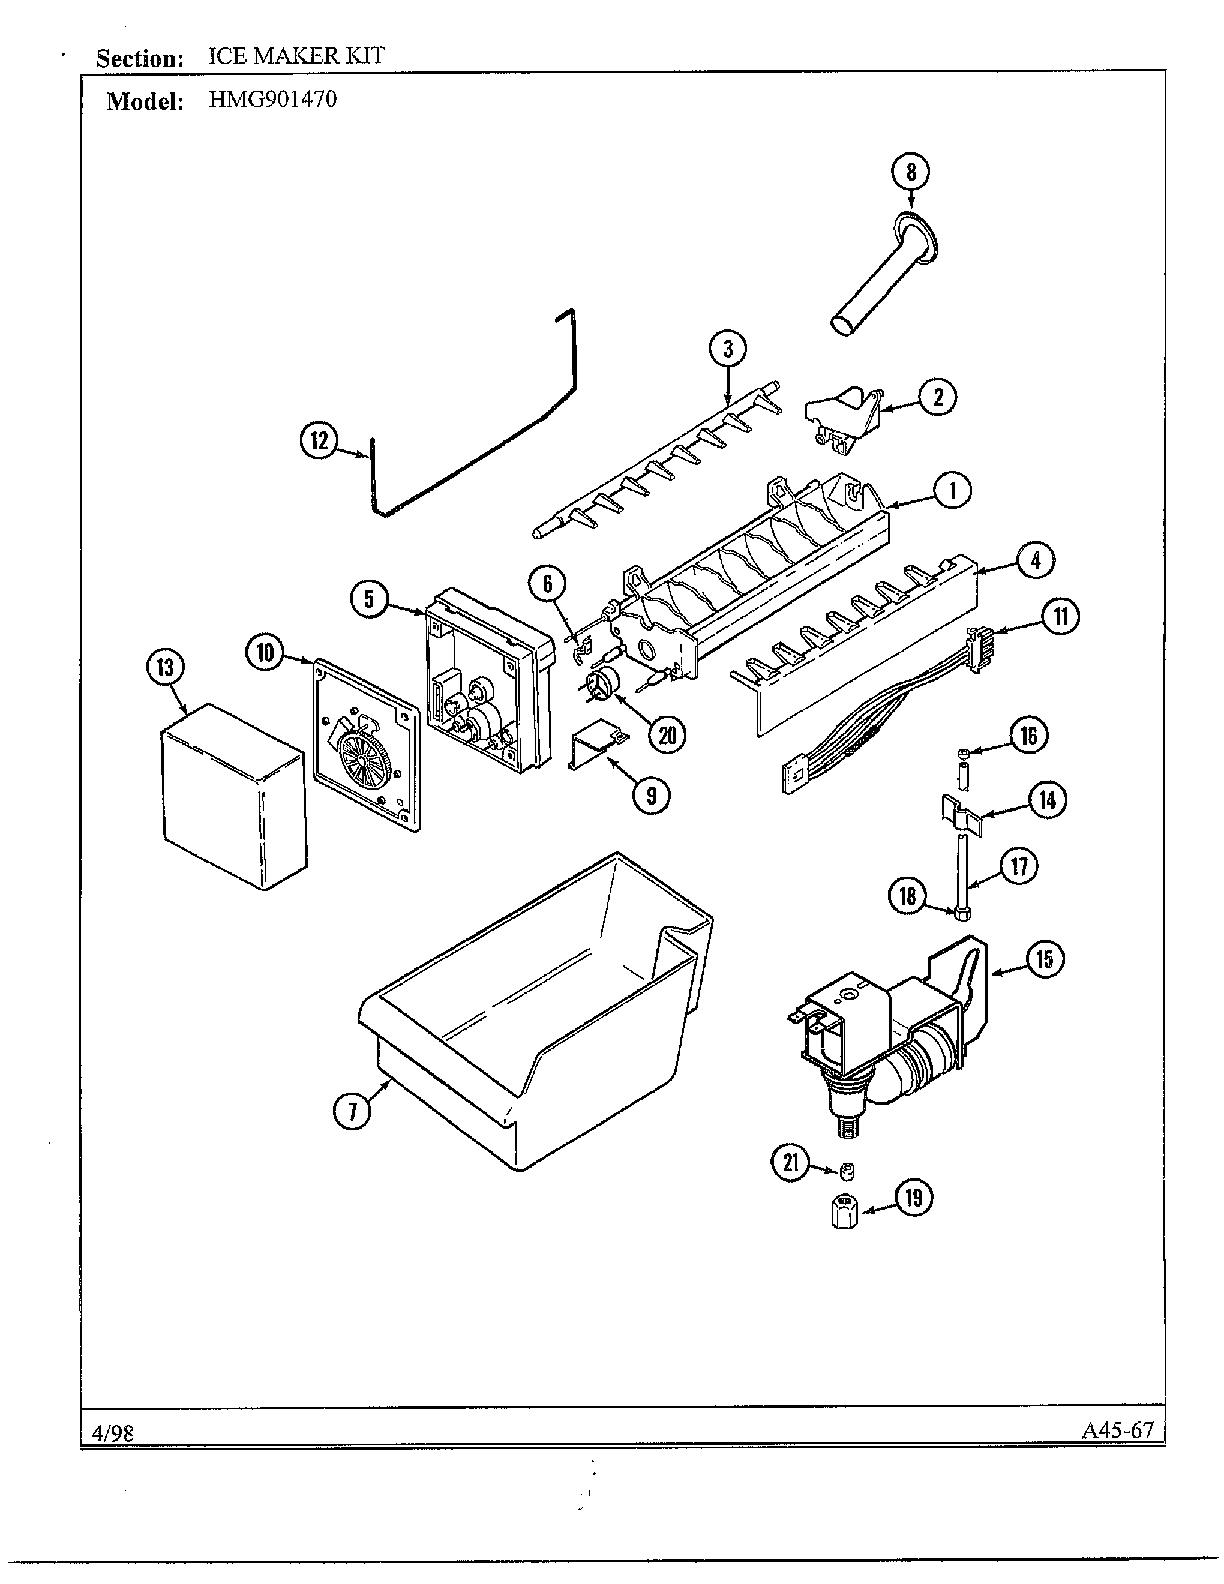 Admiral model HMG901470 ice maker kits genuine parts